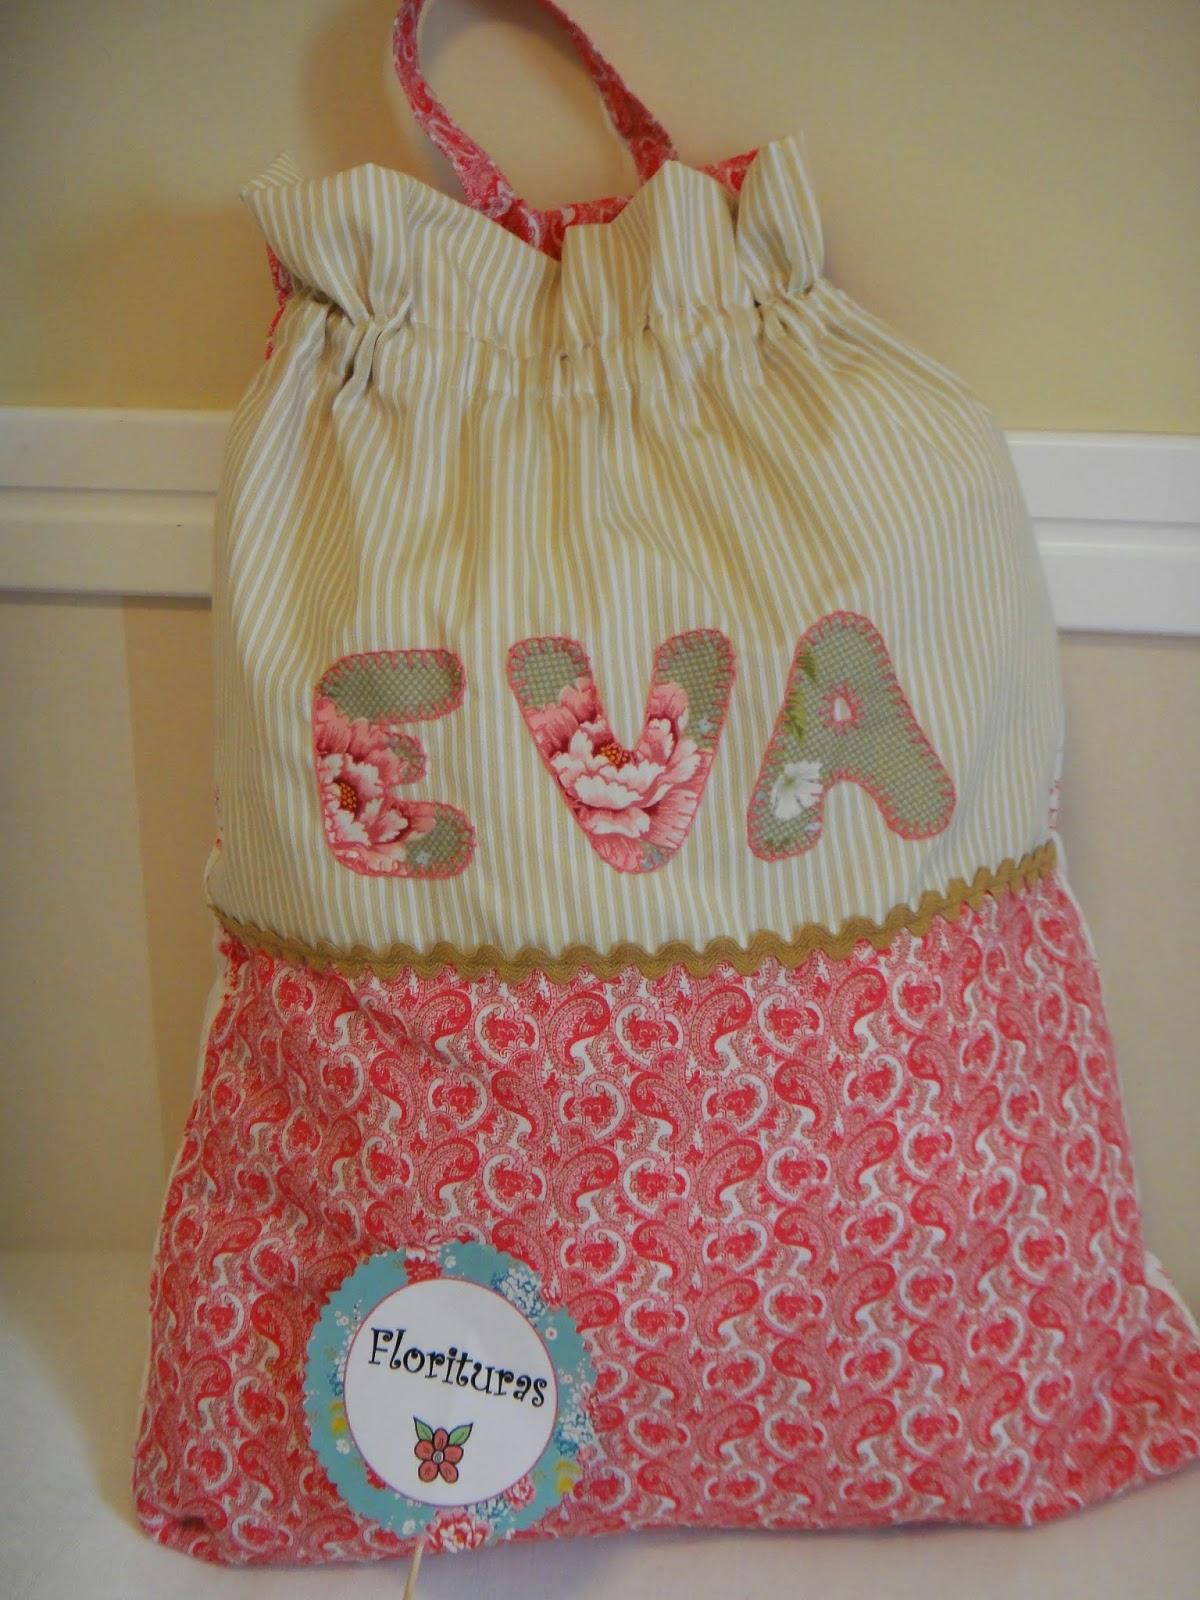 Florituras by gara bolsa para ropa sucia o meter juguetes - Bolsas para ropa ...